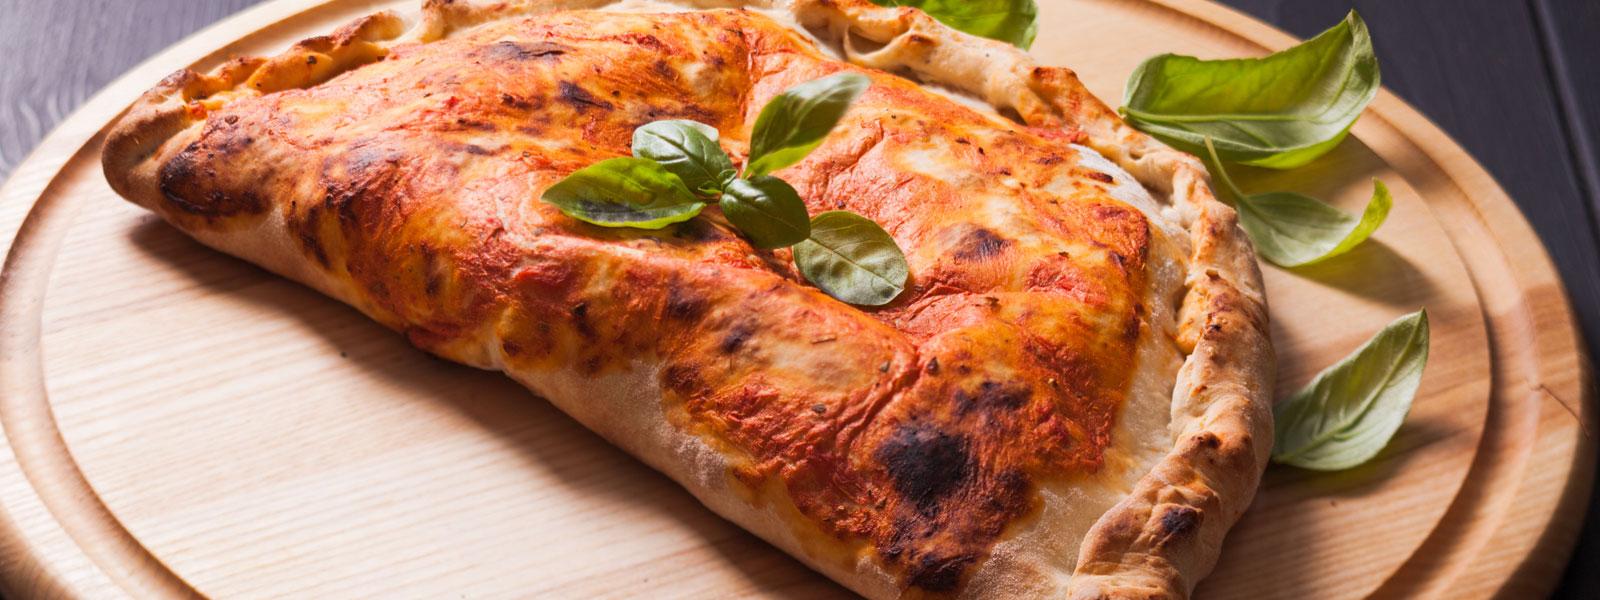 Leoruskys Pizzeria Leoruskys Pizzeria Birstalltakeaway